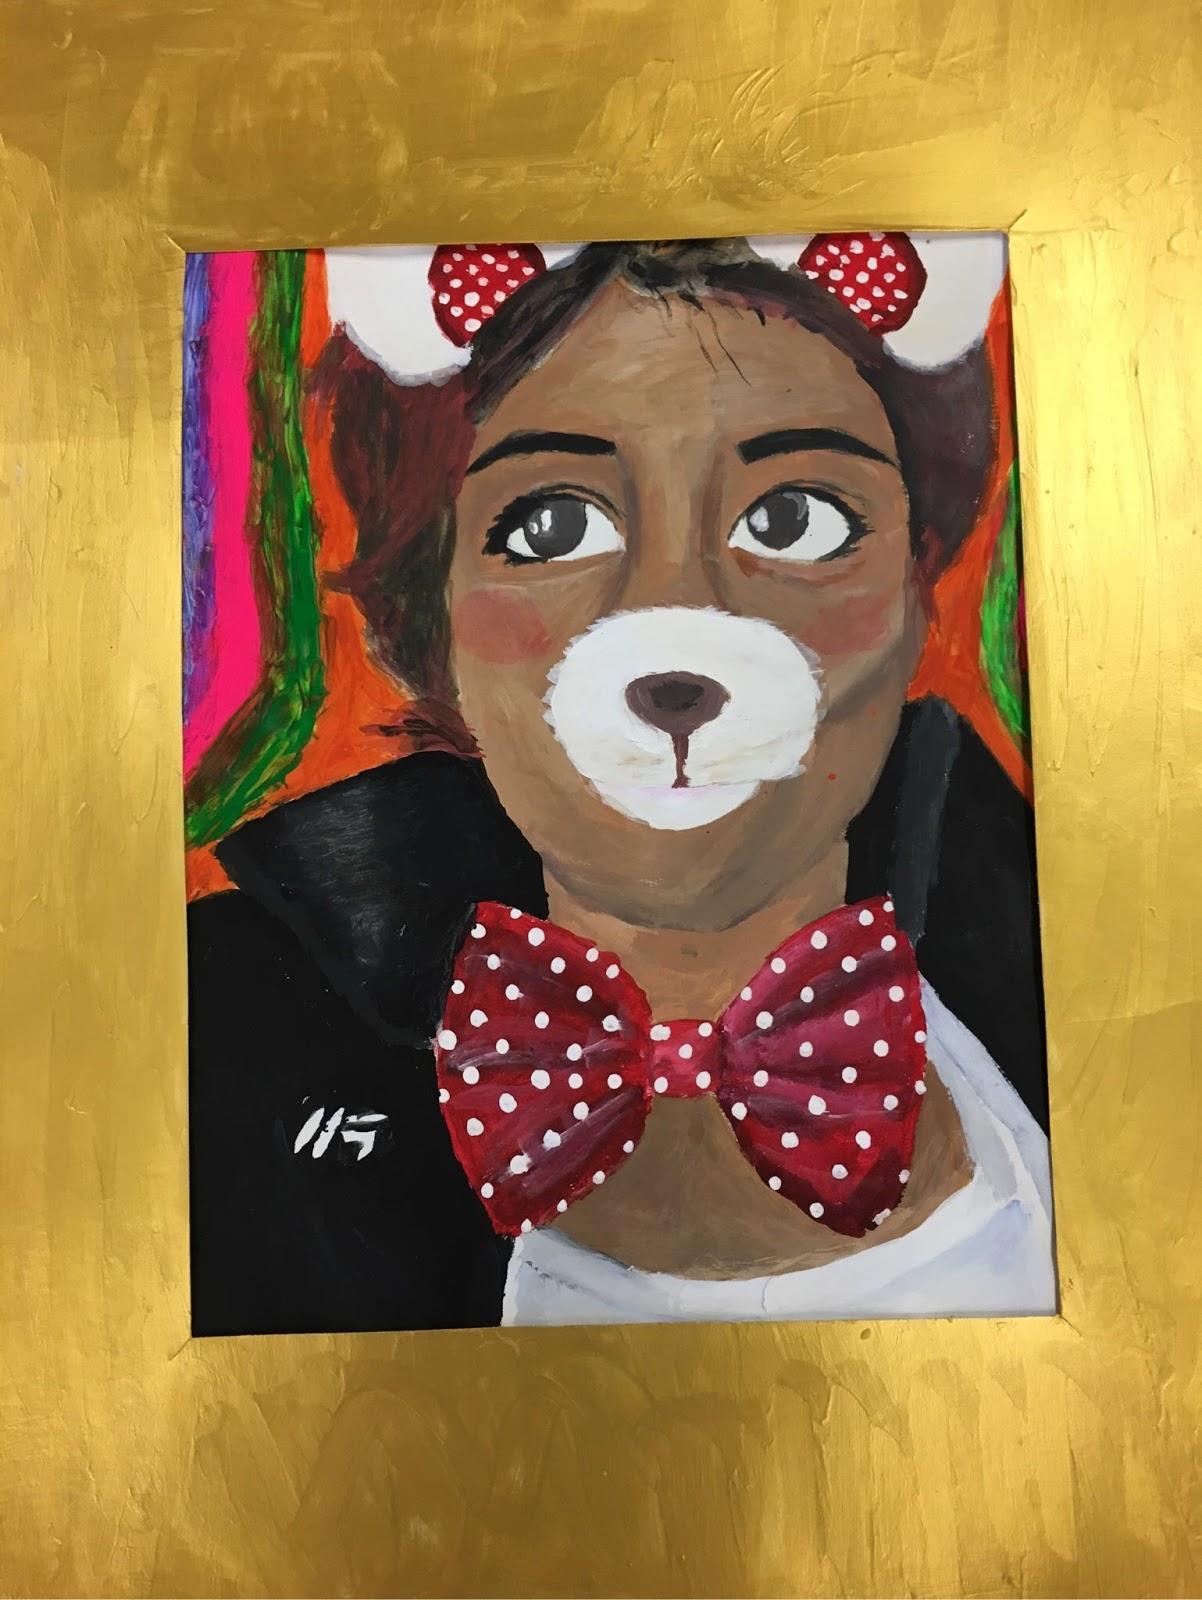 Art Eat Tie Dye Repeat Snapchat Self Portraits